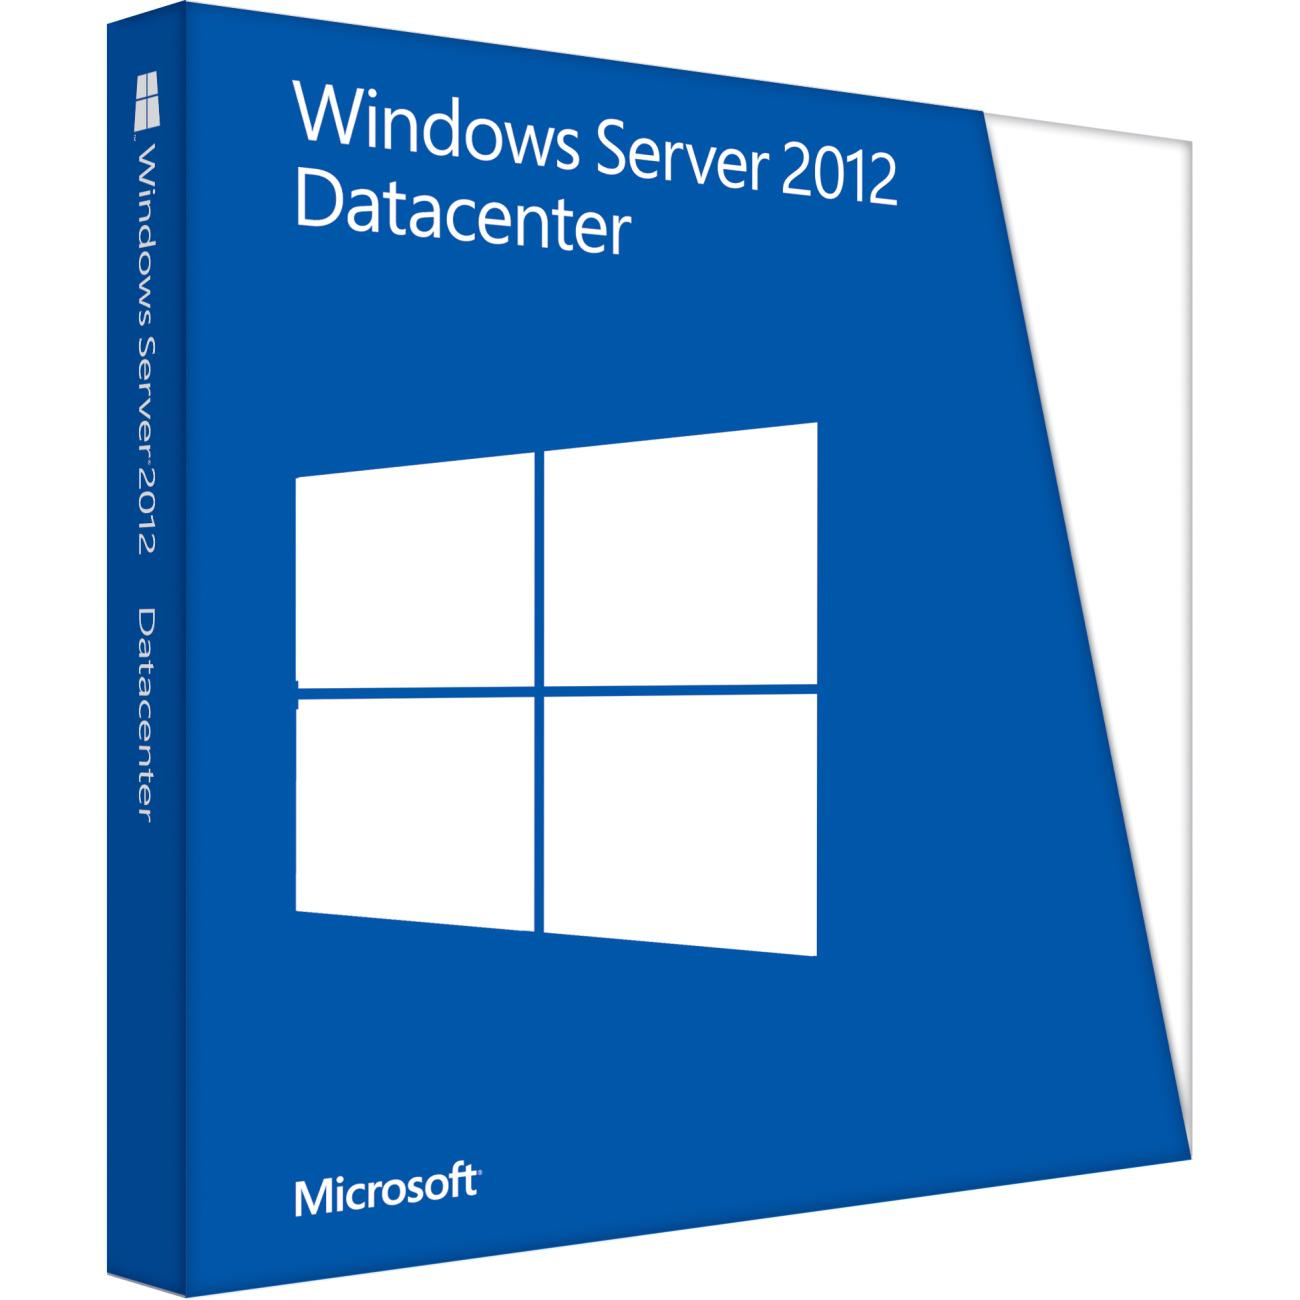 Win Svr Datacntr 2012 x64 English 1pk DSP OEI DVD 2 CPU P71-06769